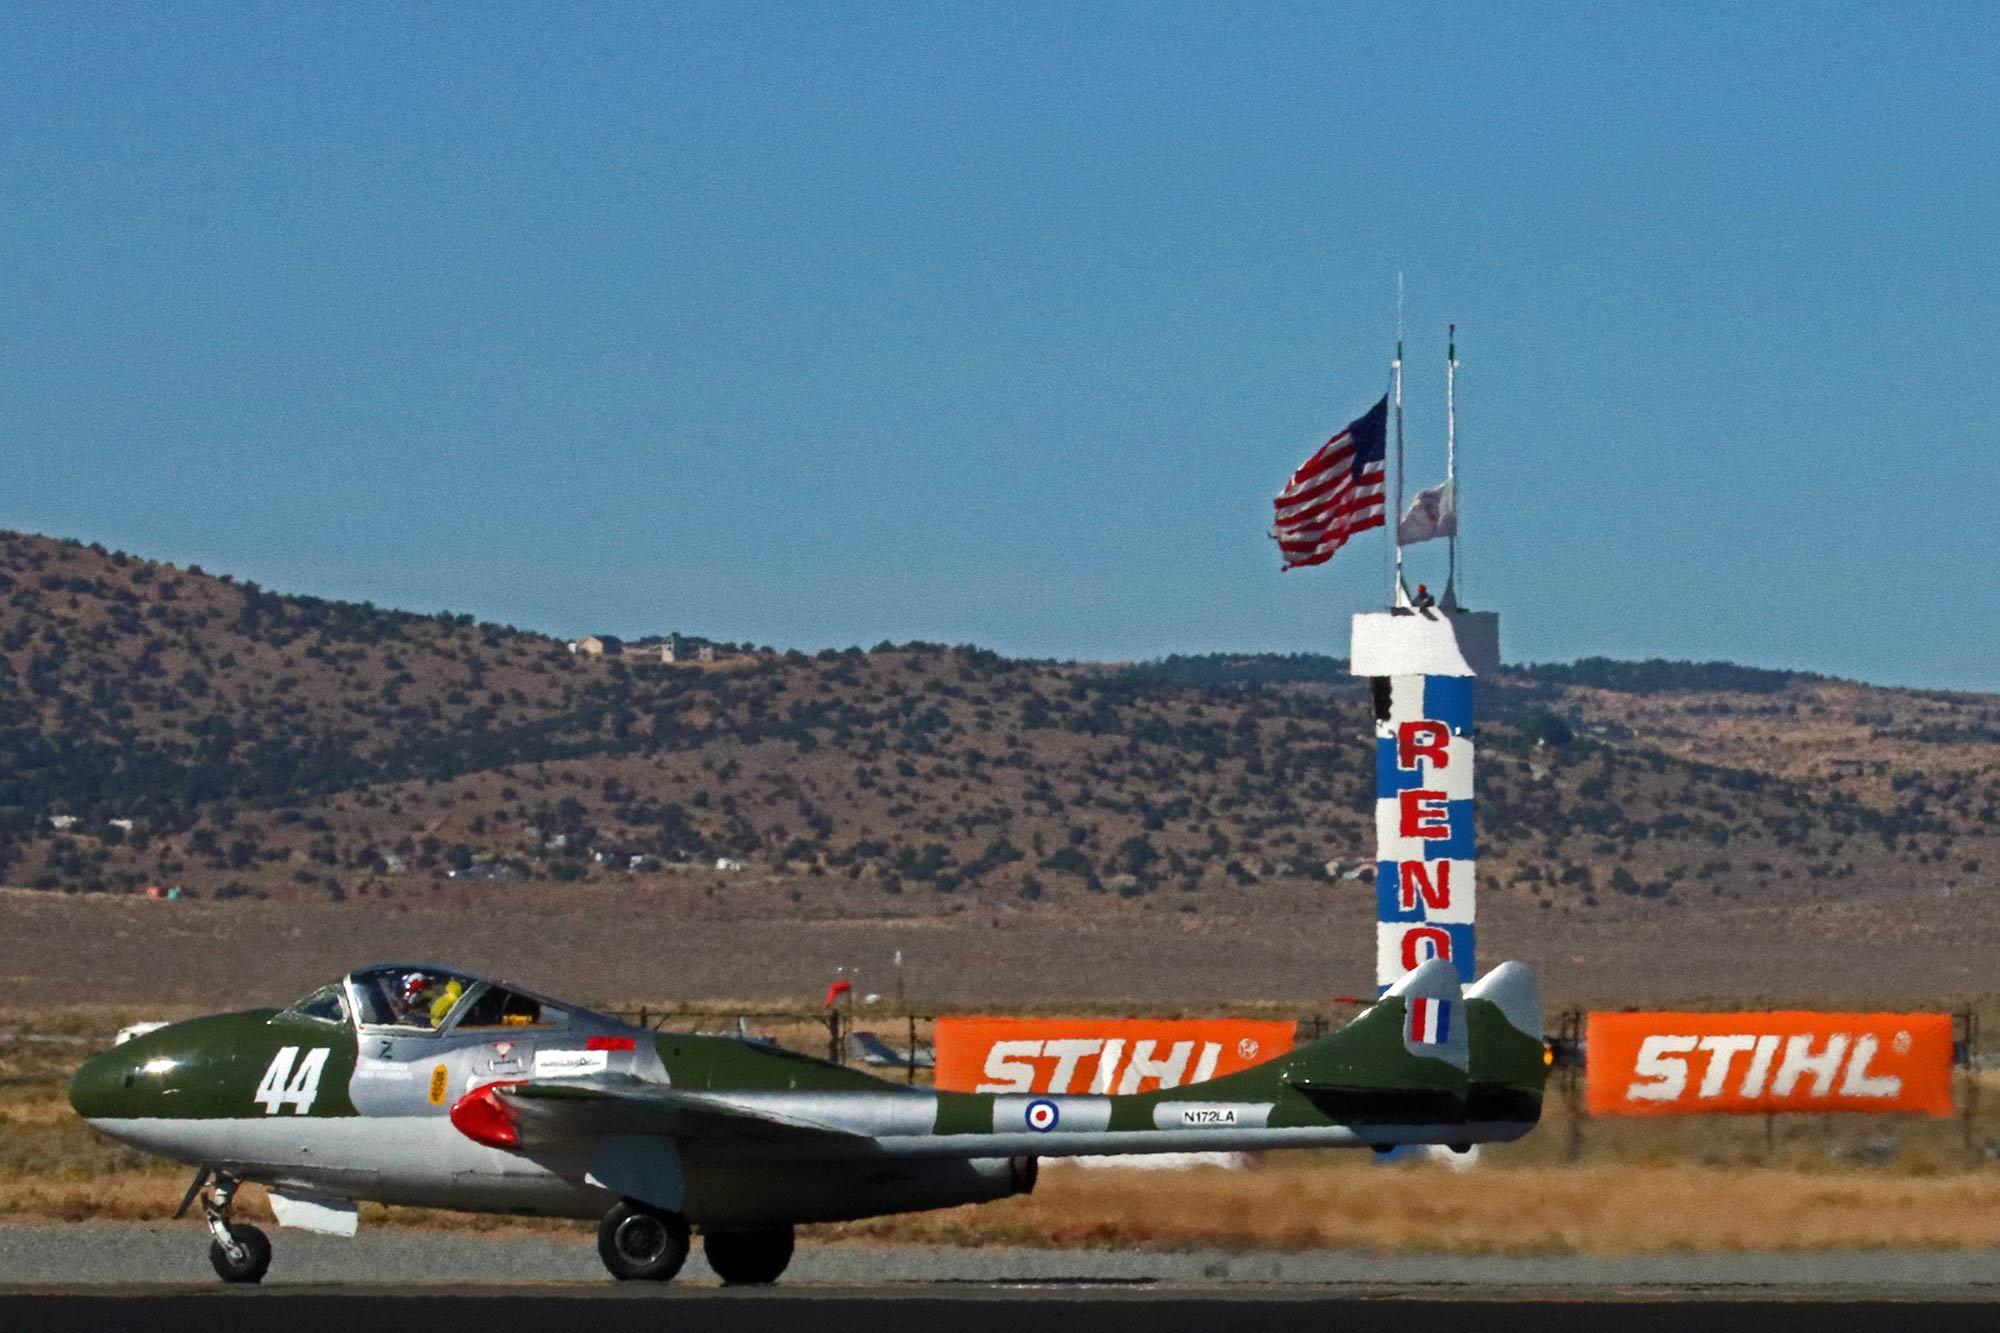 Jet-44-Heat1A-5thplace-160916Reno_1717